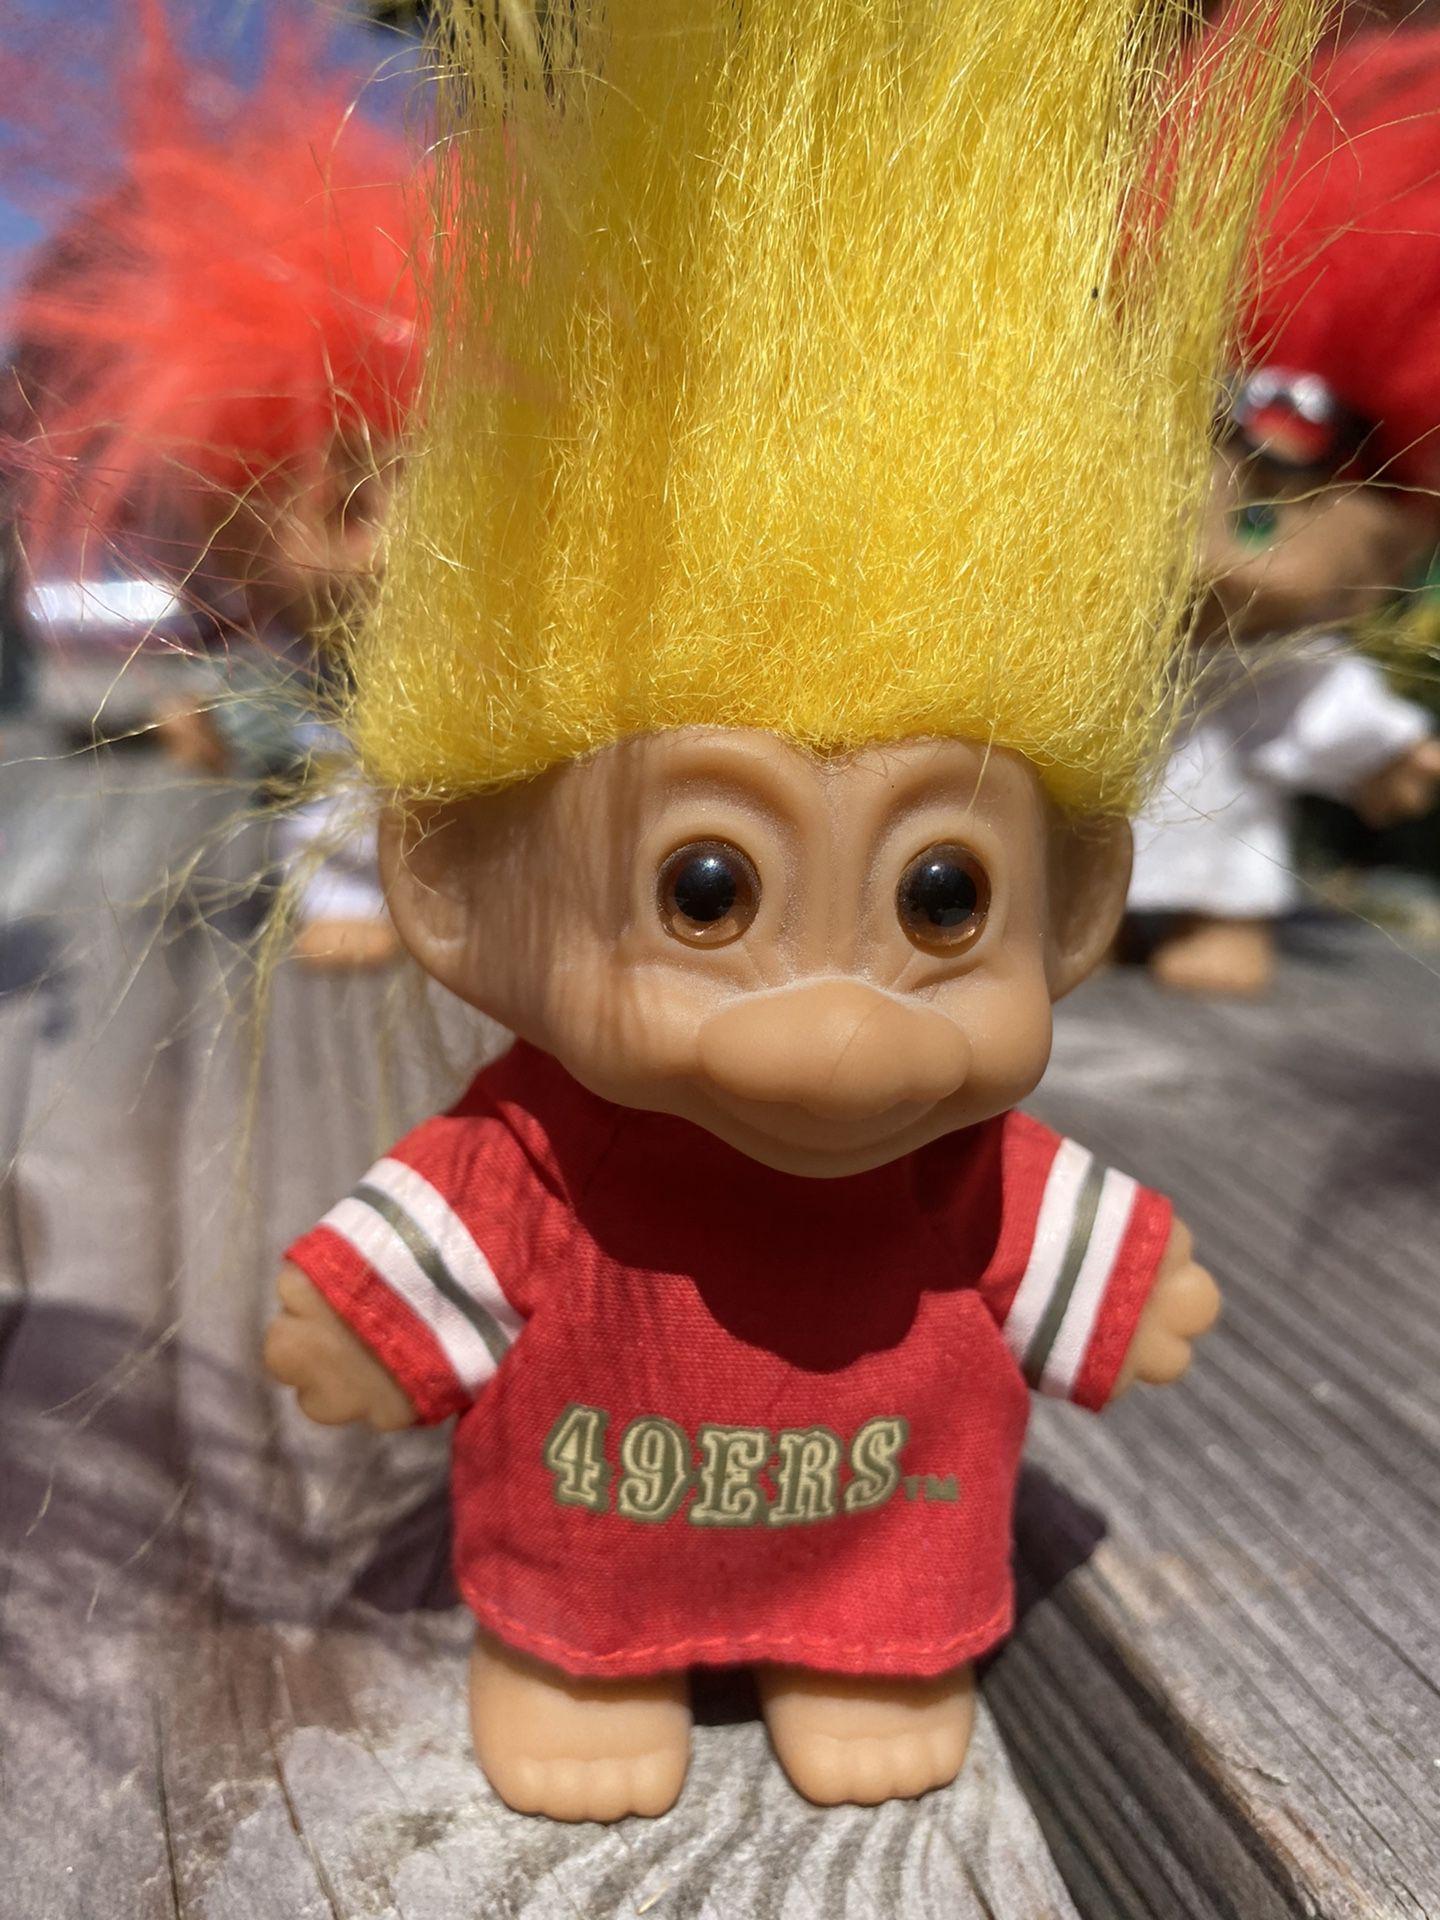 Original Russ Trolls 49ers Collectible Dolls Toys